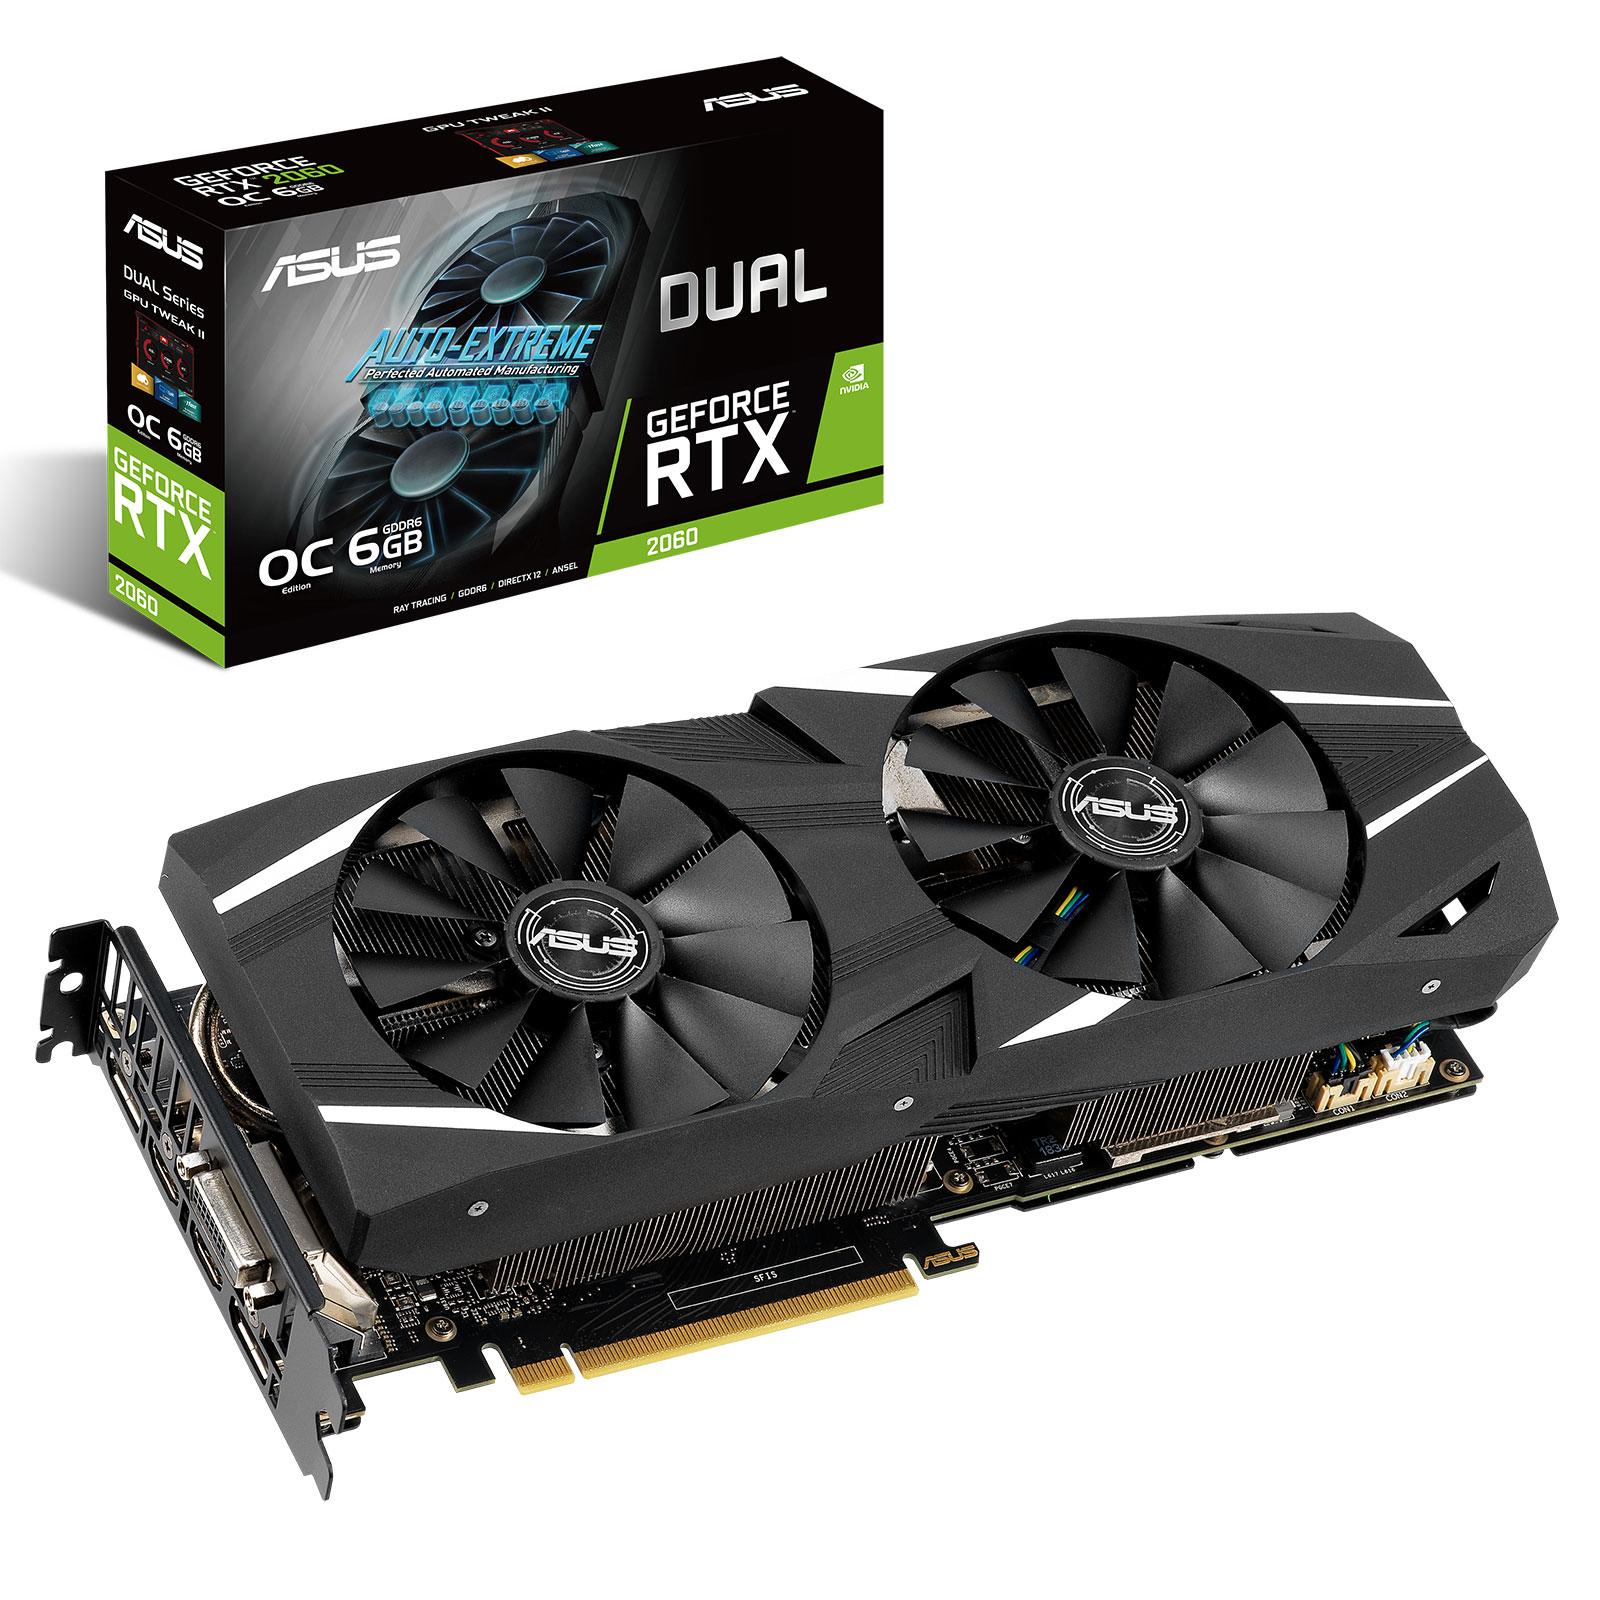 Carte graphique ASUS GeForce RTX 2060 DUAL-RTX2060-O6G 6 Go GDDR6 - Dual HDMI/Dual DisplayPort/DVI - PCI Express (NVIDIA GeForce RTX 2060)